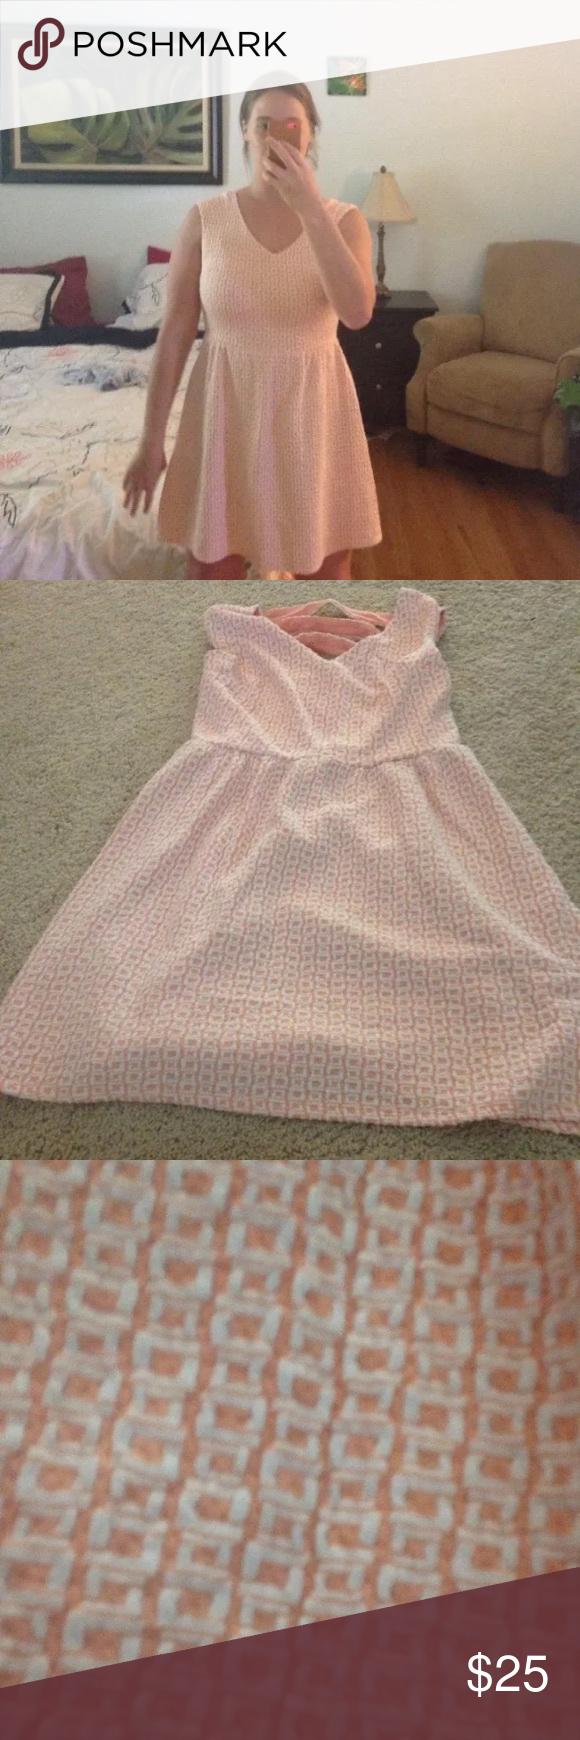 1e2b60d0e439 Last call❗️Orange and white tropical dress Cute summer dress from target Xhilaration  Dresses Mini